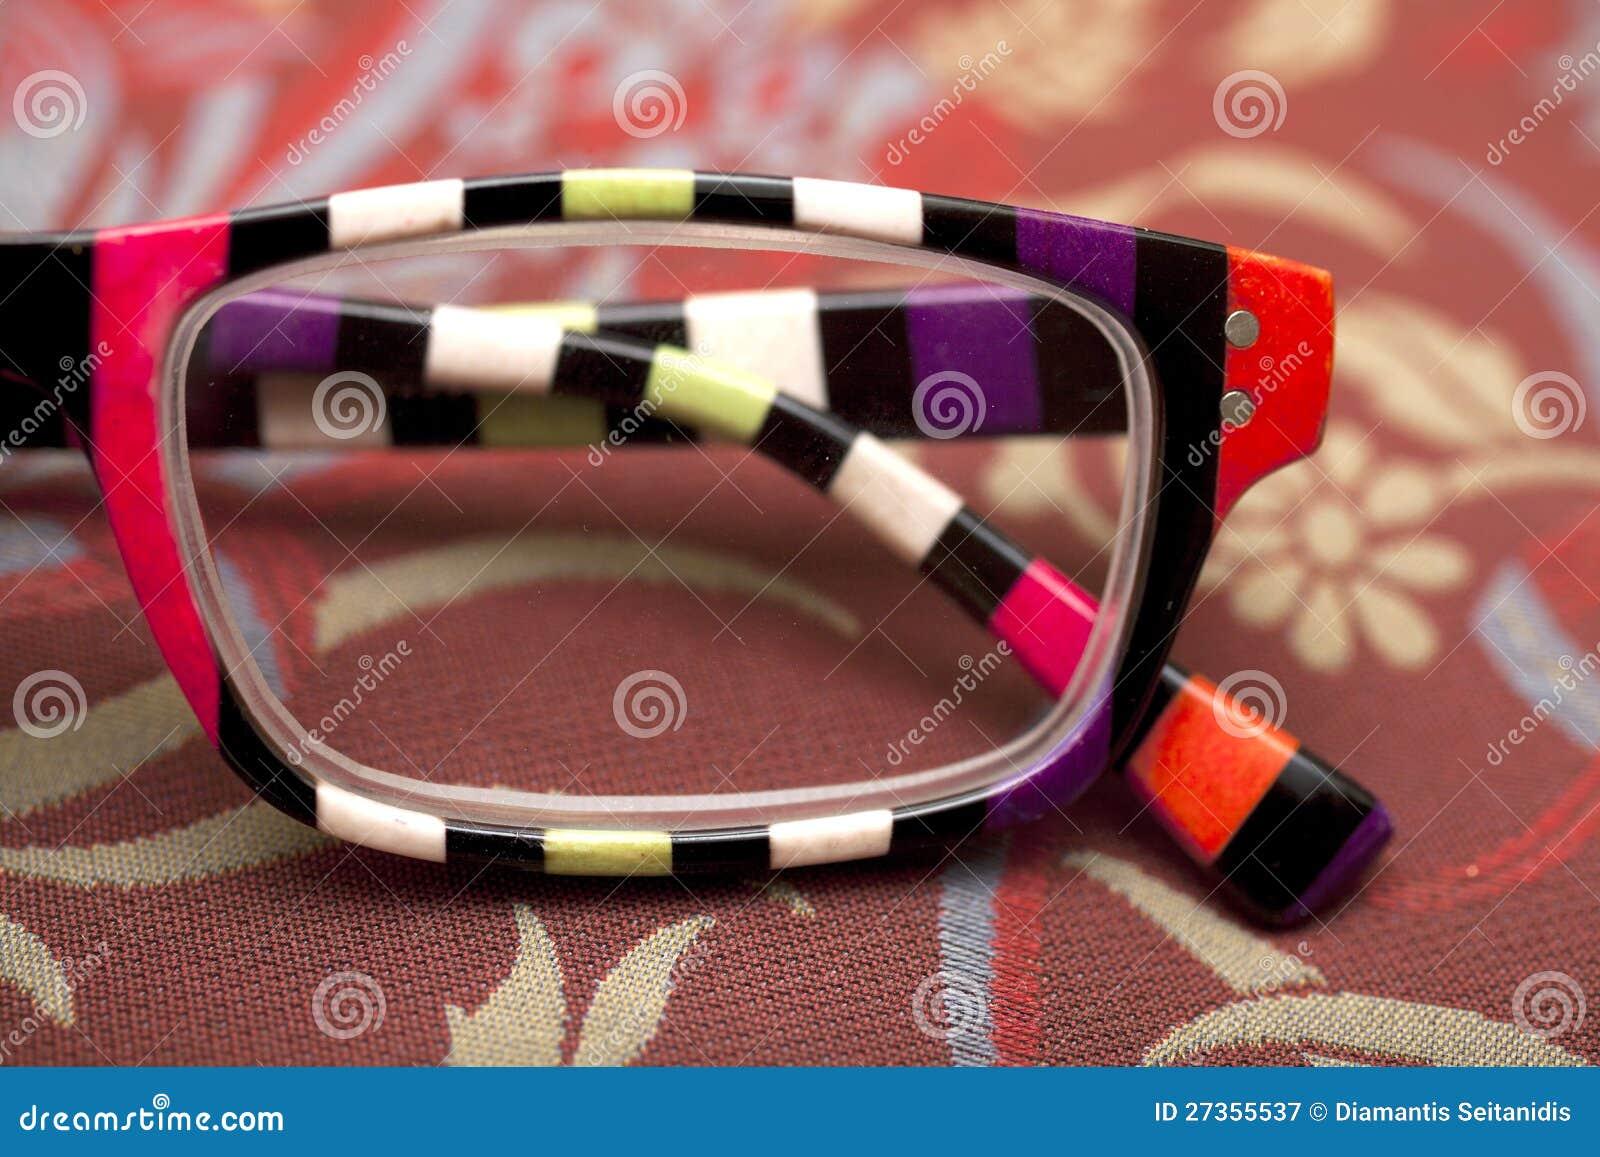 Colorful eyeglass frame stock illustration. Illustration of ...